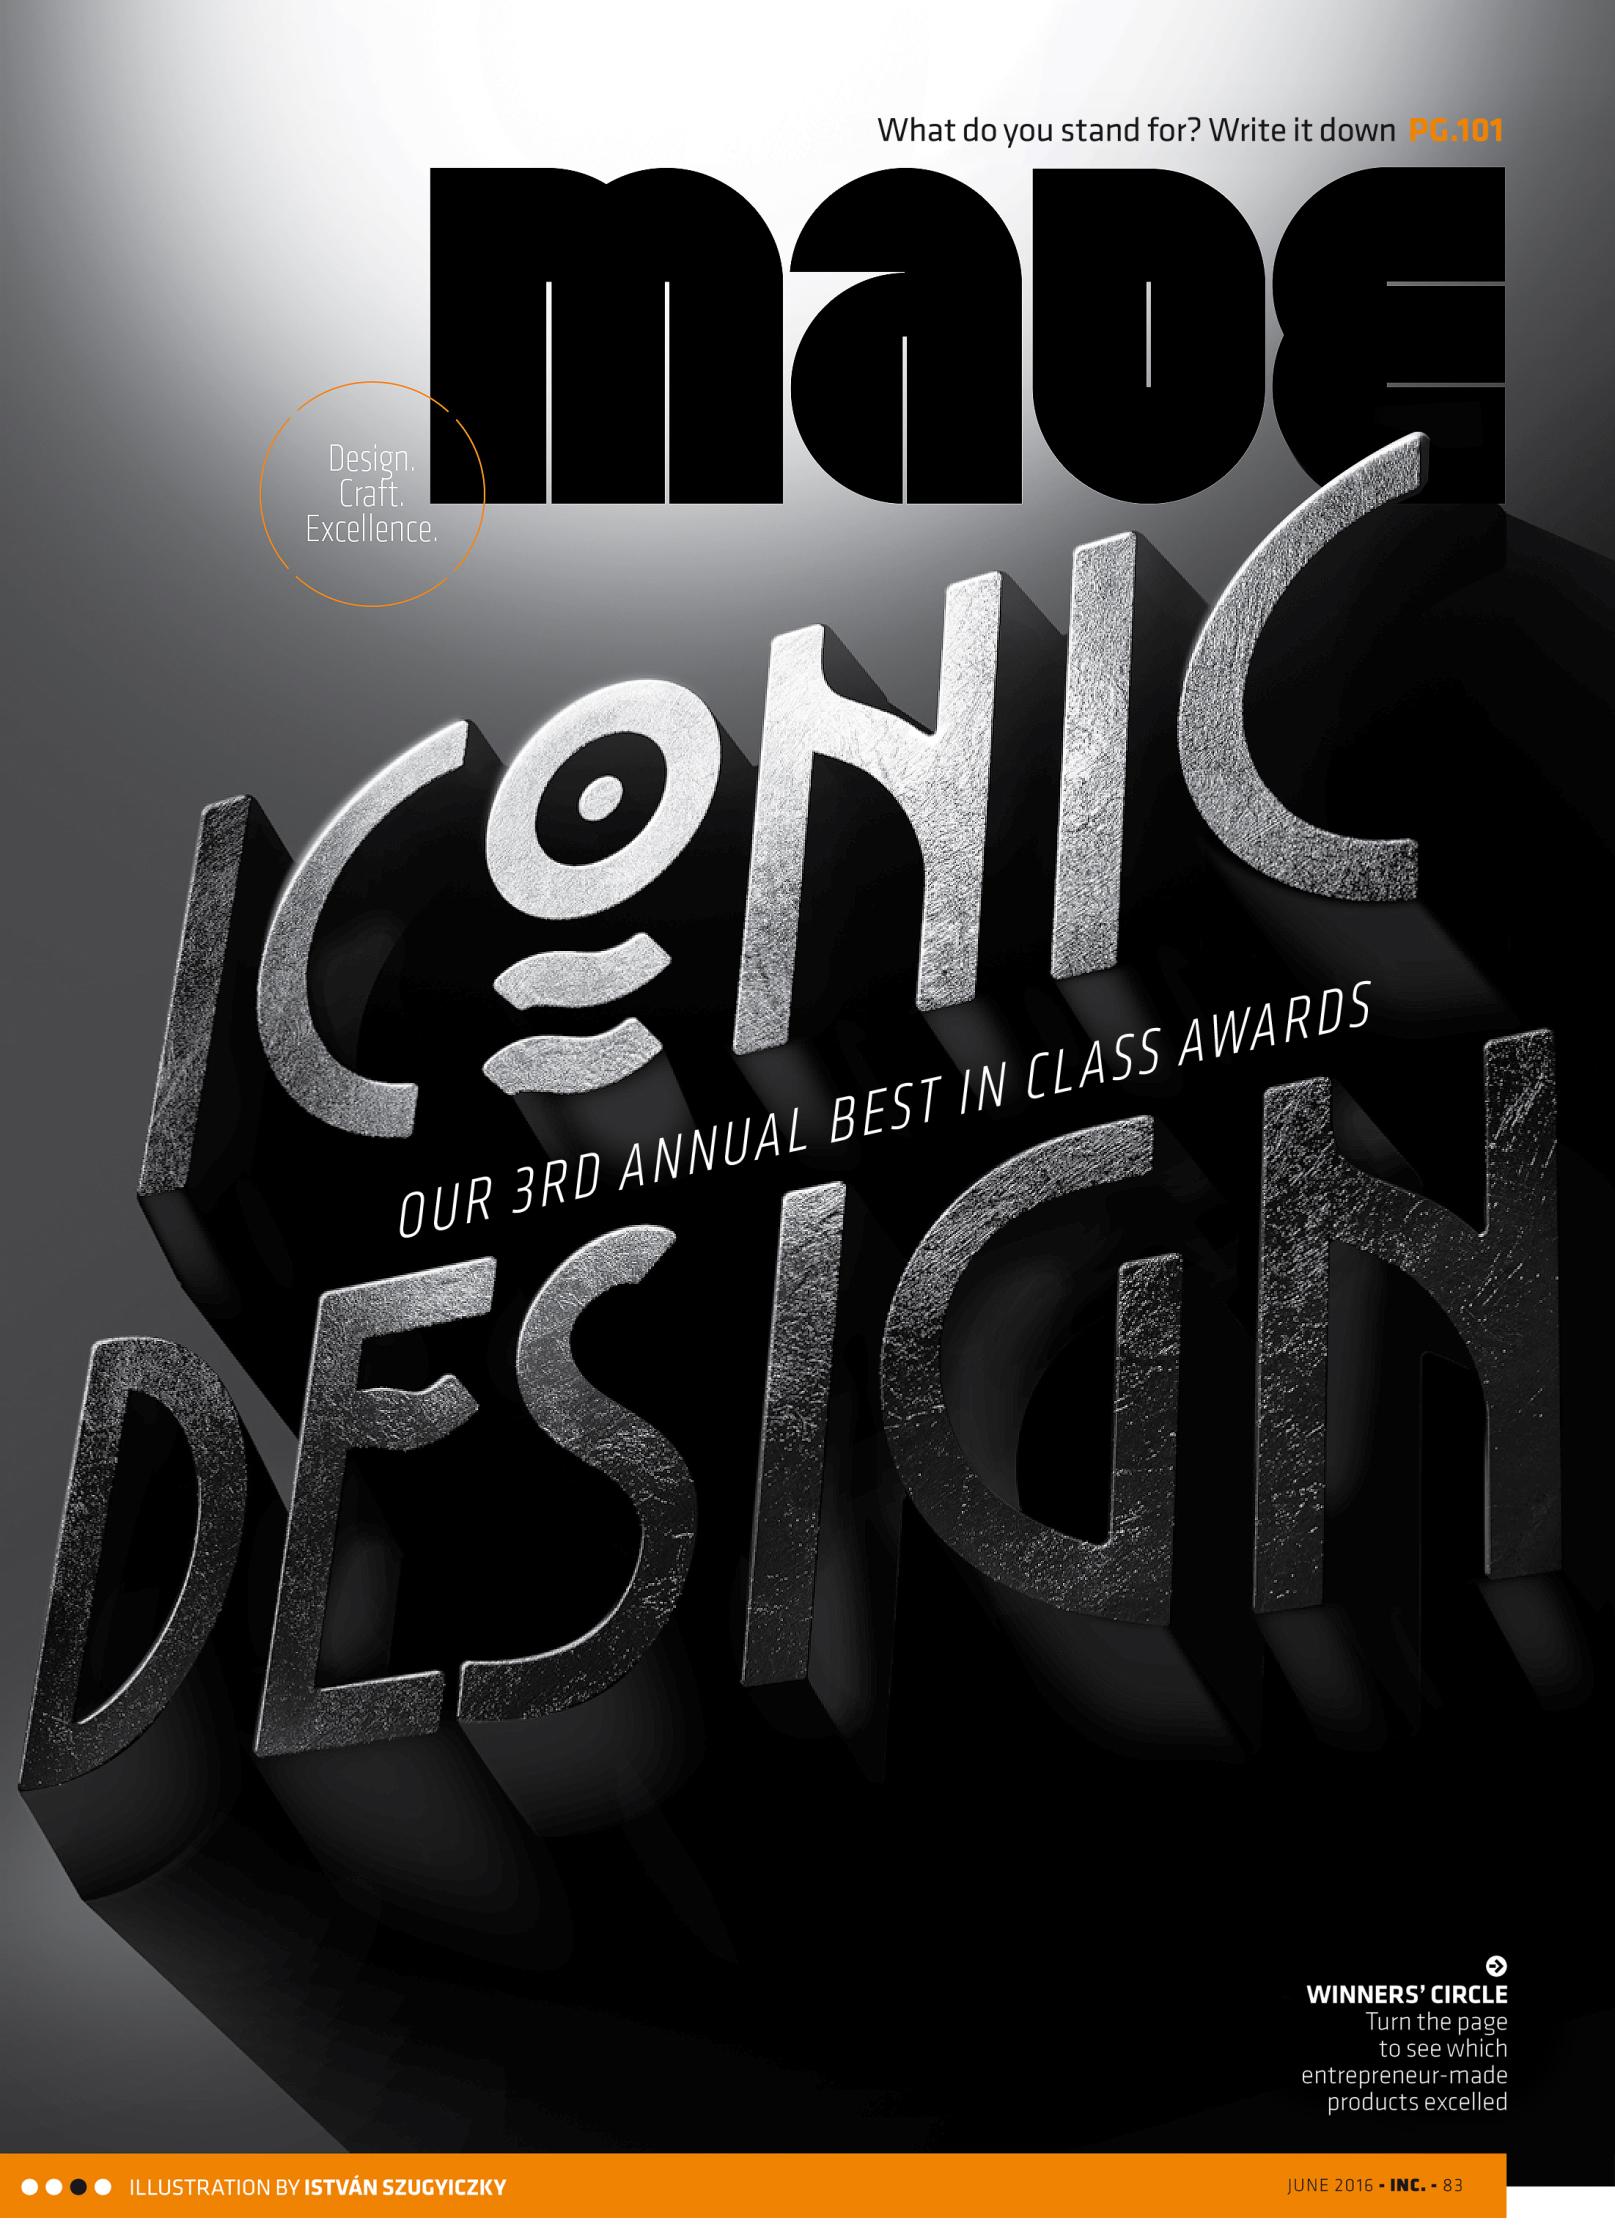 Iconic_Design_Made_RGB.jpg